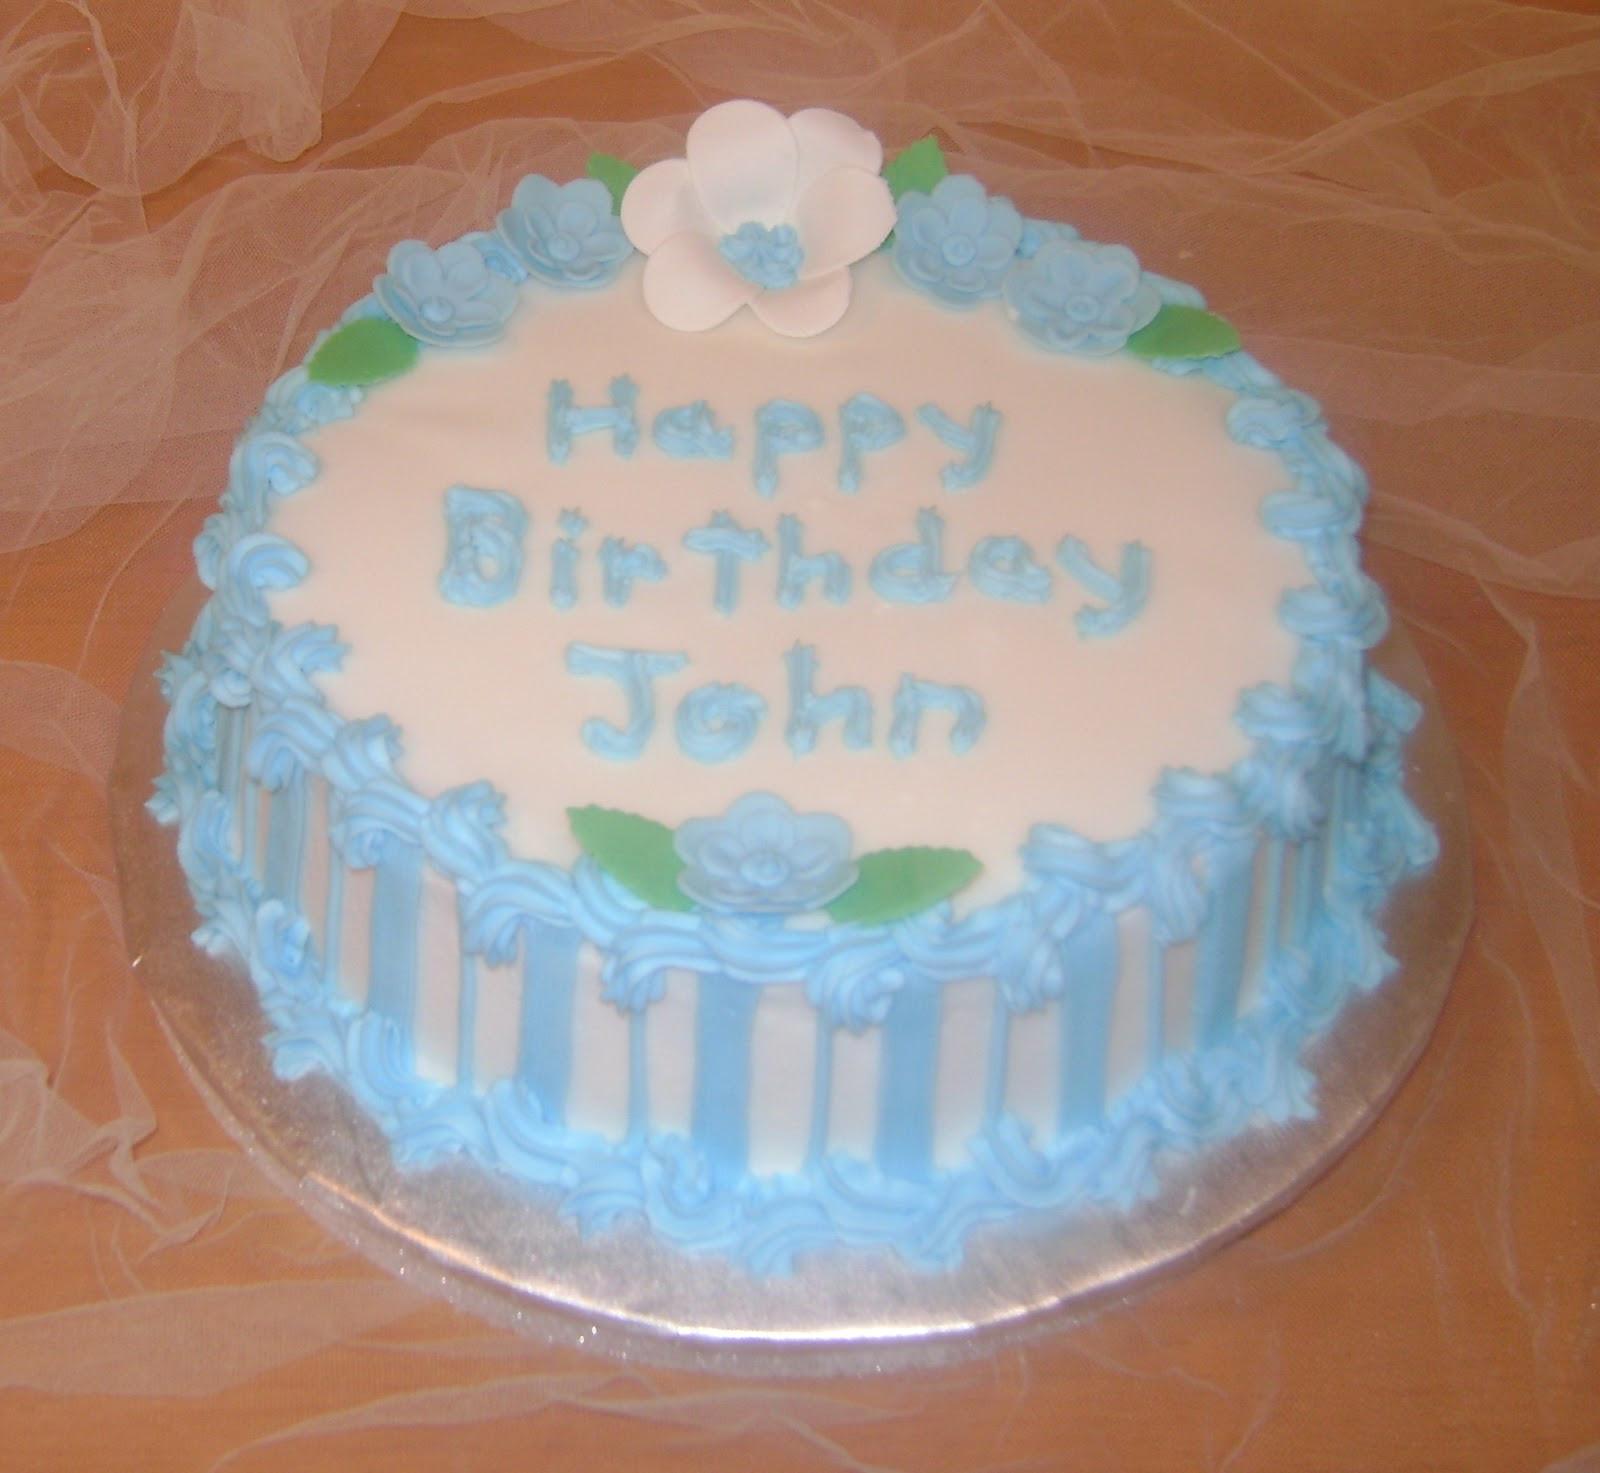 Best ideas about Happy Birthday John Cake . Save or Pin Marilyn s Caribbean Cakes Happy Birthday John Now.